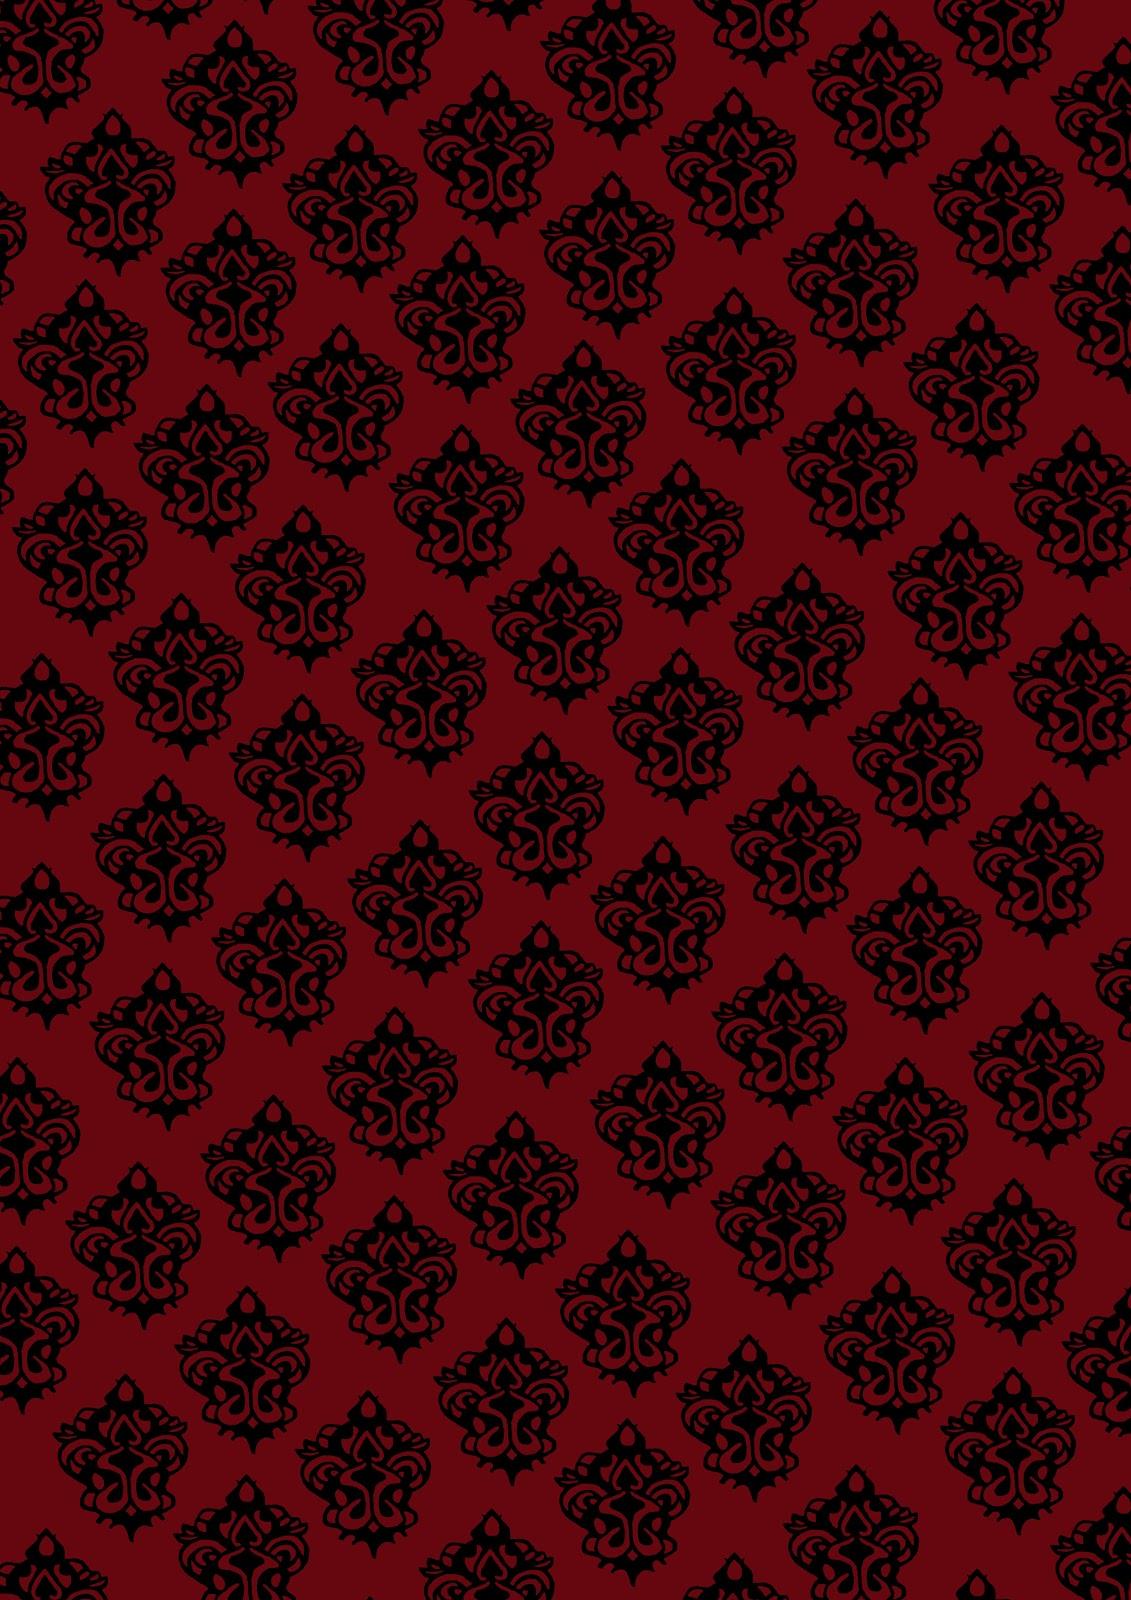 gothic patterns wallpaper pattern - photo #24